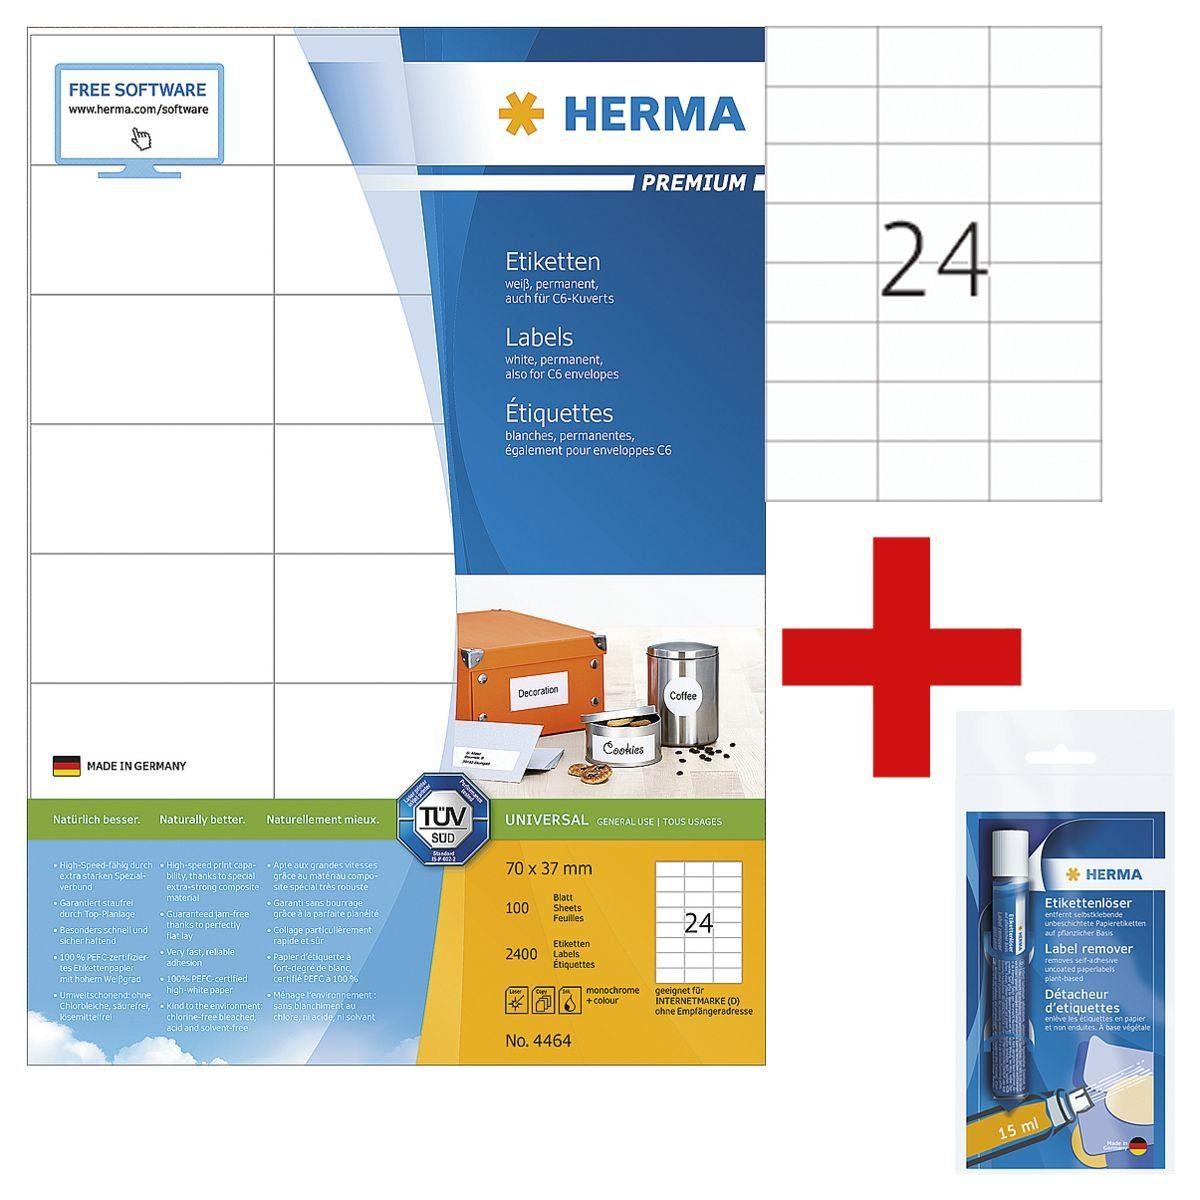 HERMA 2400er-Set Universal-Klebeetiketten inkl. Etikettenlöser... »4464« 1 Set